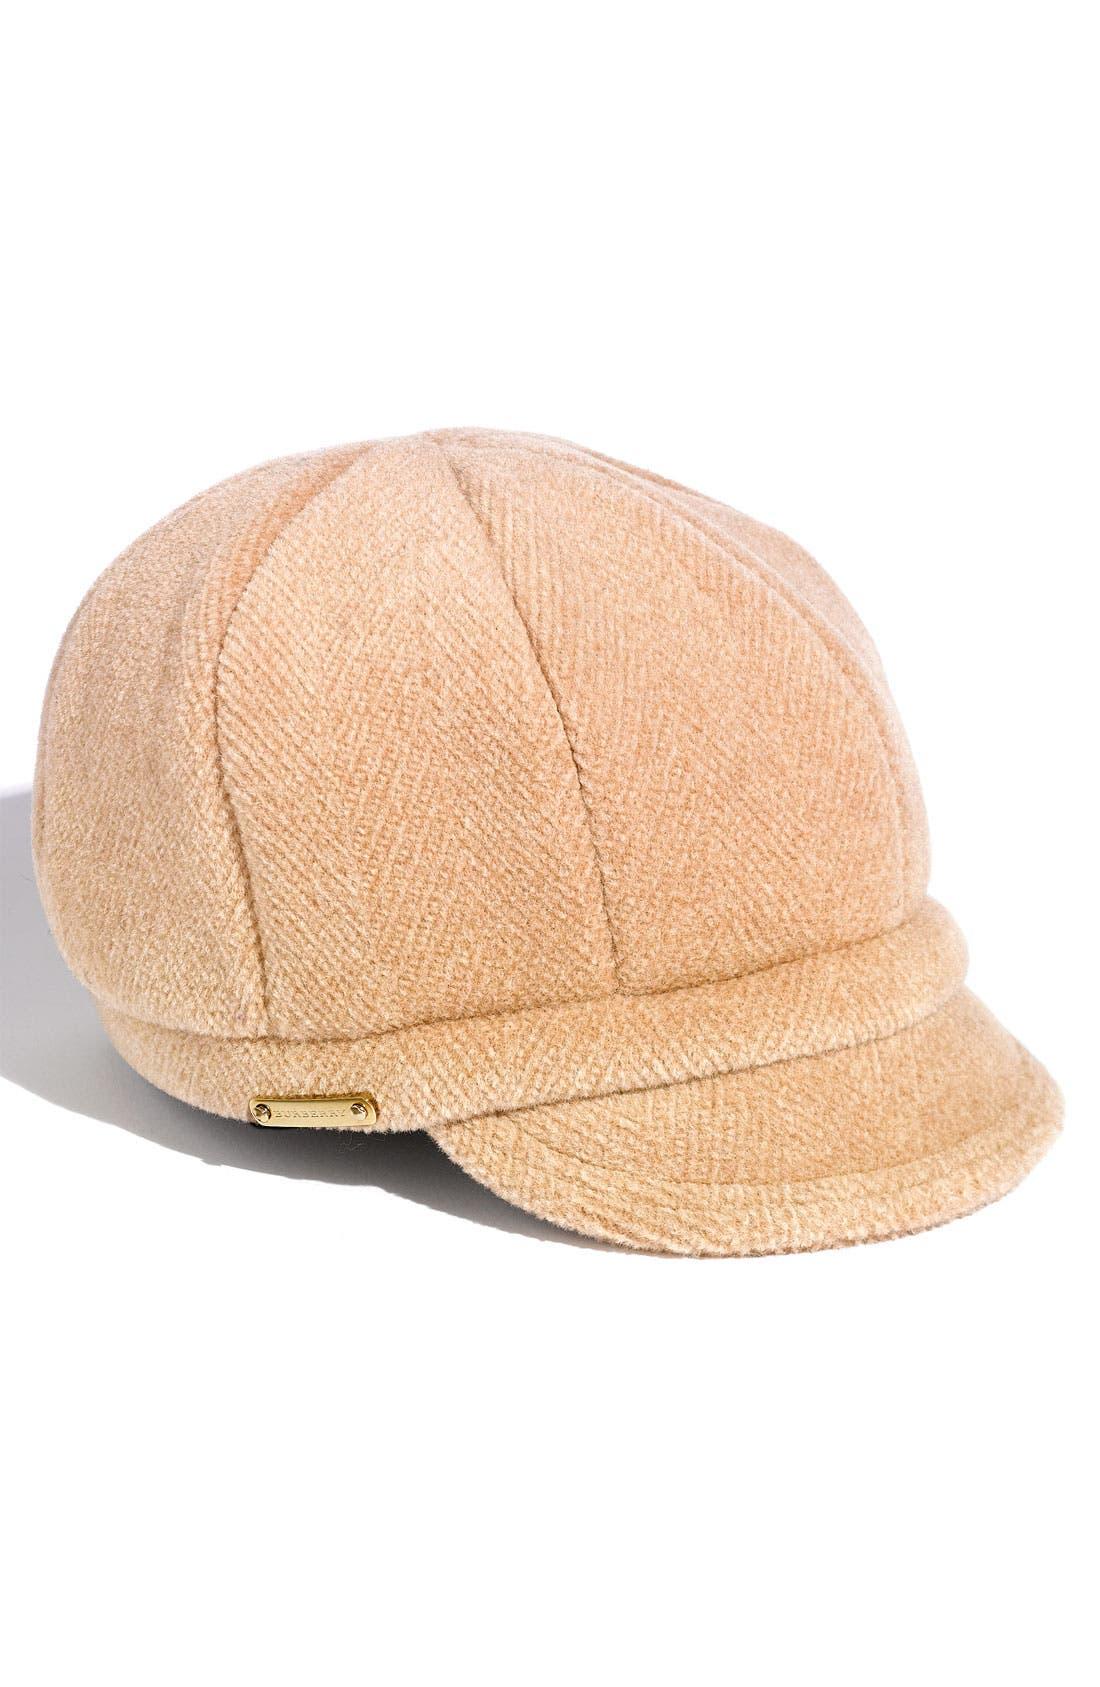 Main Image - Burberry Wool Duffle Cap